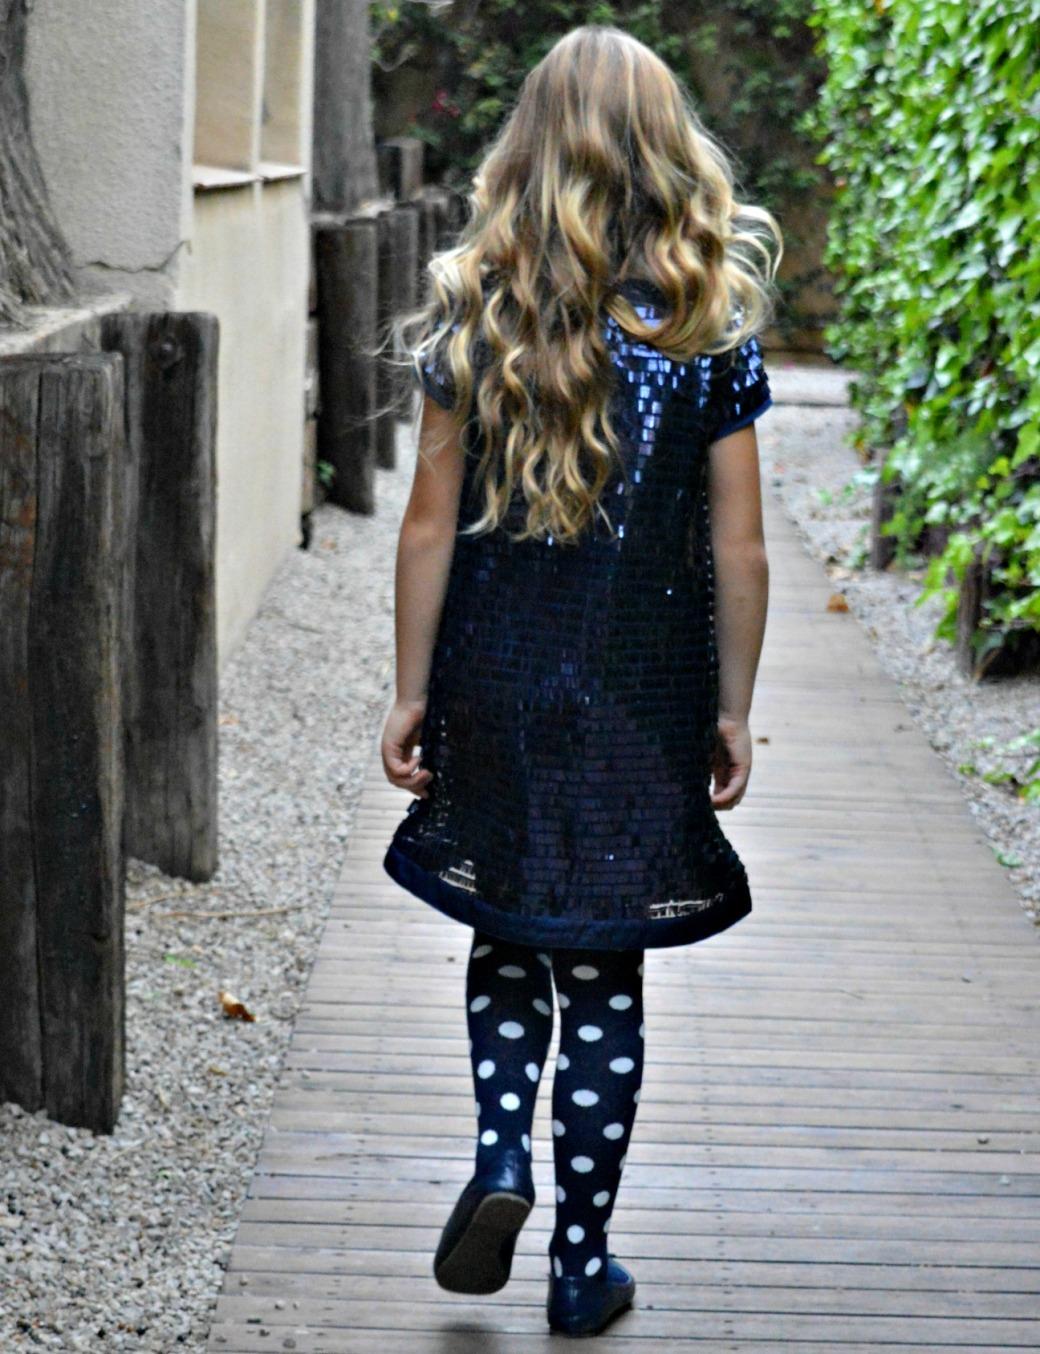 boboli-tpl-blog-de-moda-infantil-10